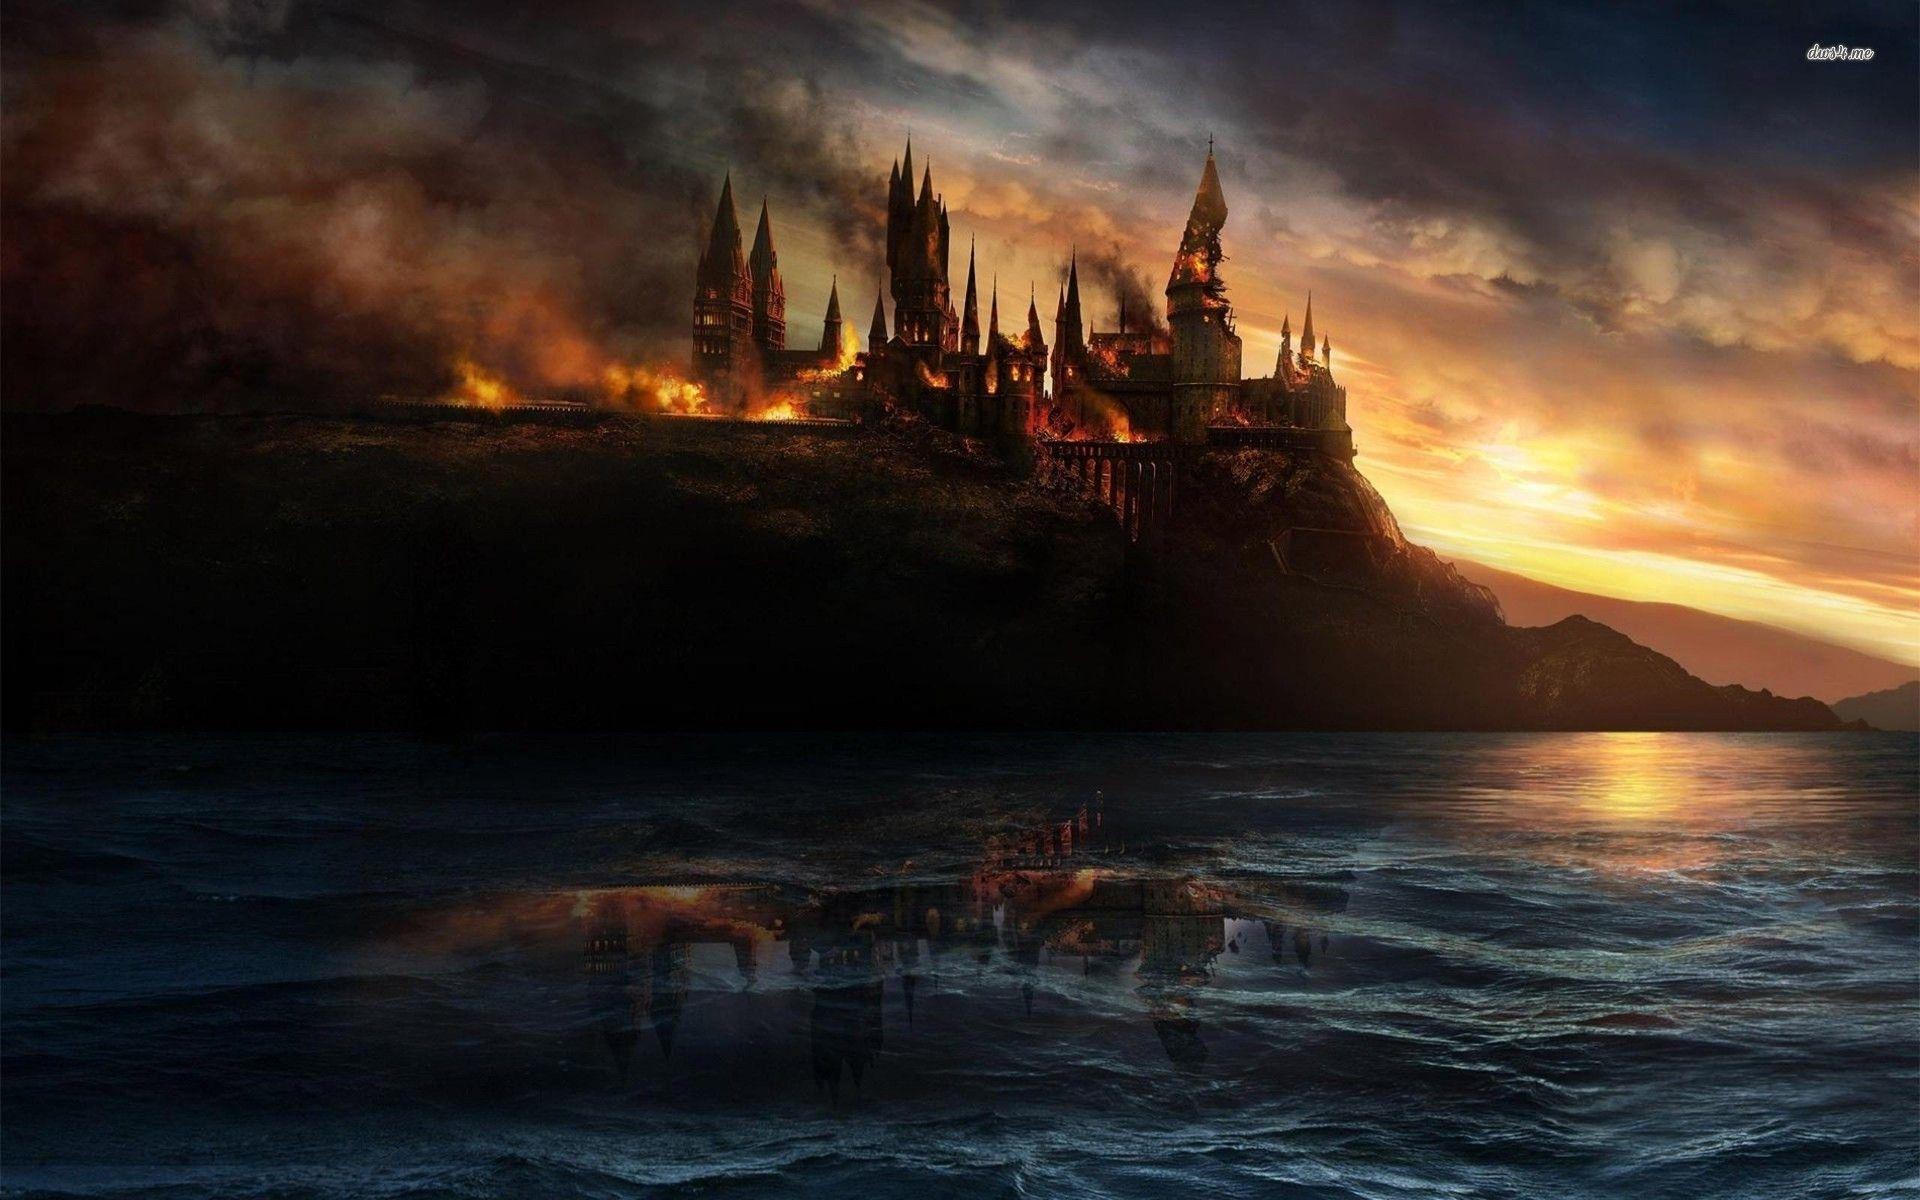 Hogwarts Castle Wallpapers - Wallpaper Cave